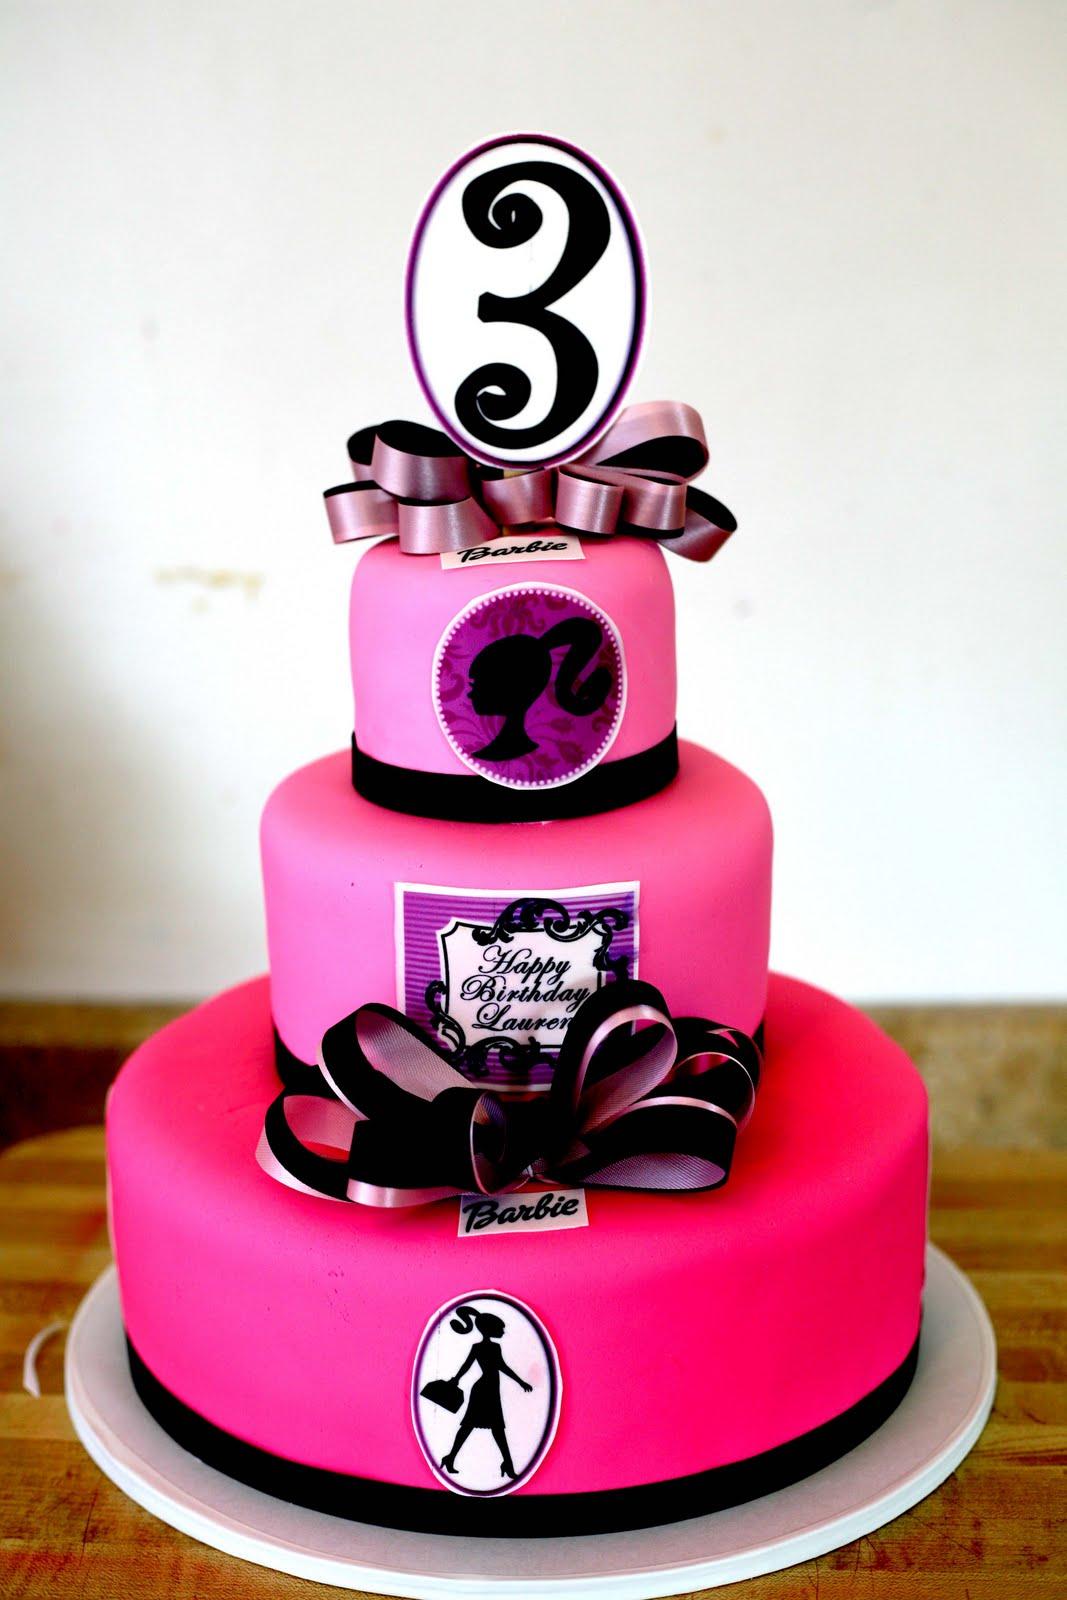 Hector S Custom Cakes Barbie Cake Barbie Silhouette Cake